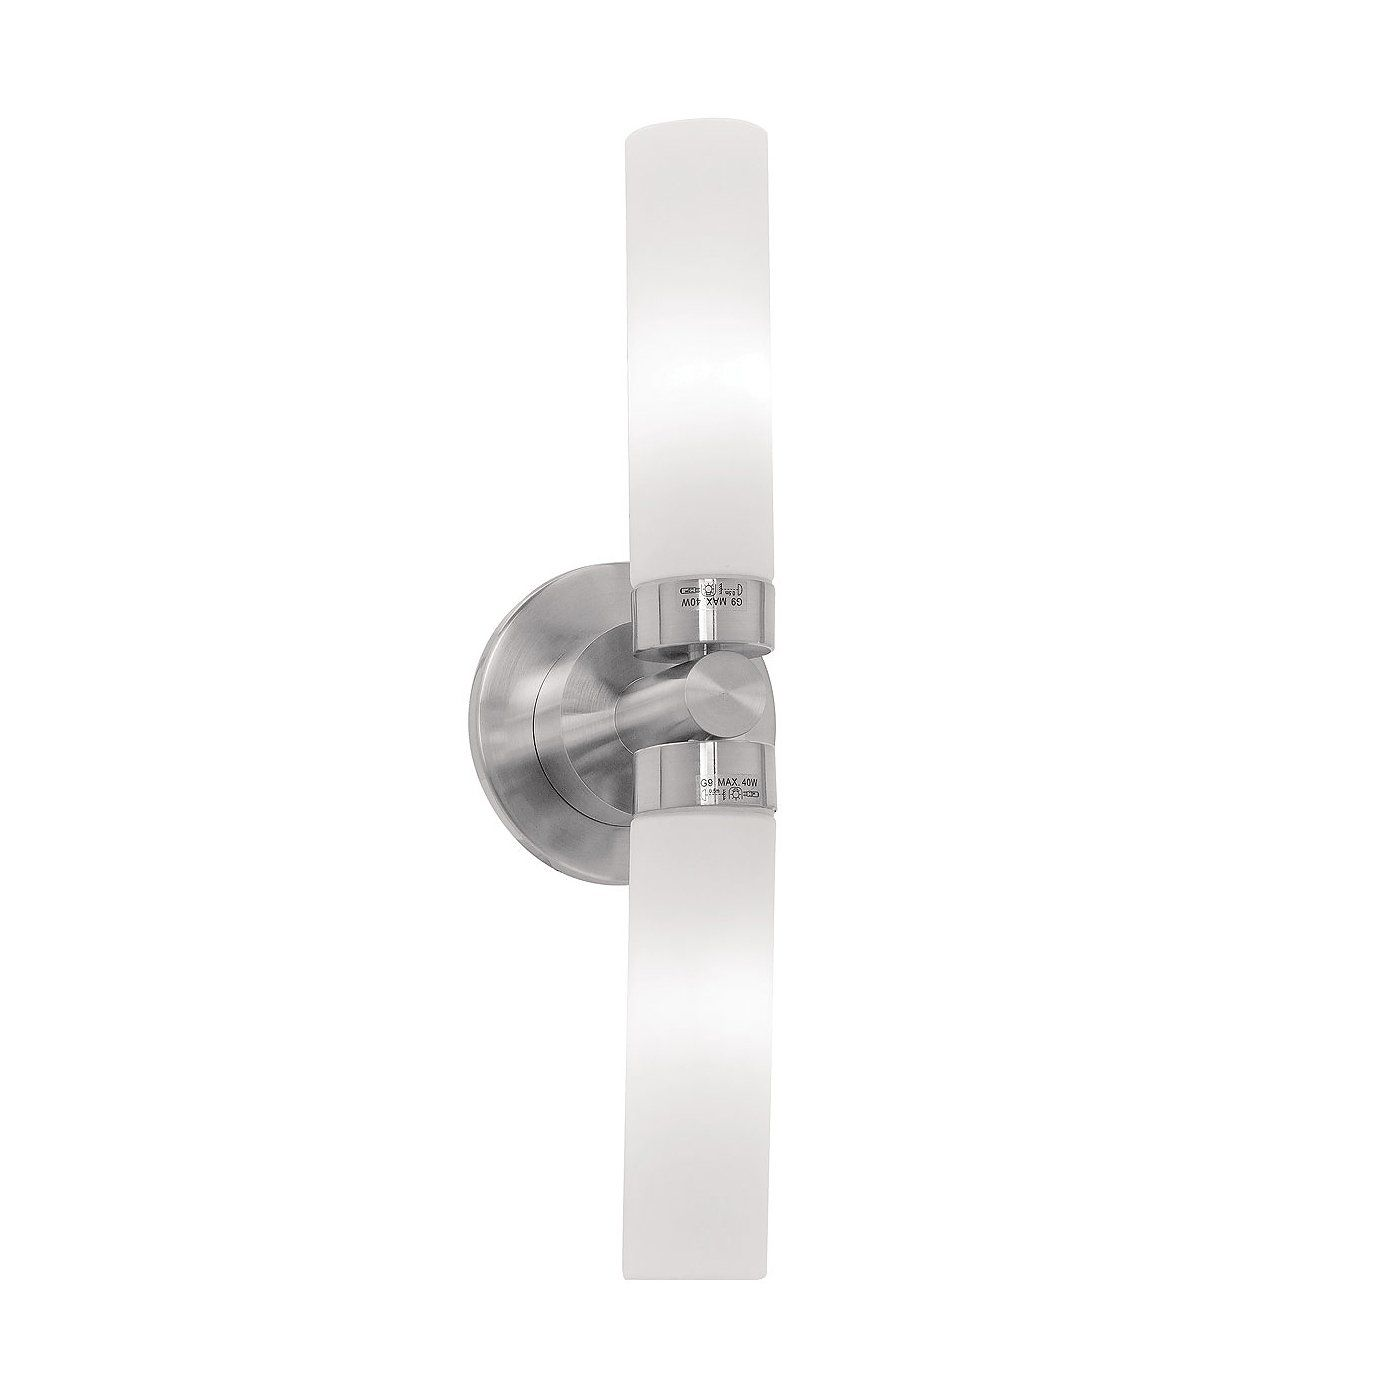 shop access lighting 50564 bs opl 2 light lynx bathroom light rh pinterest com